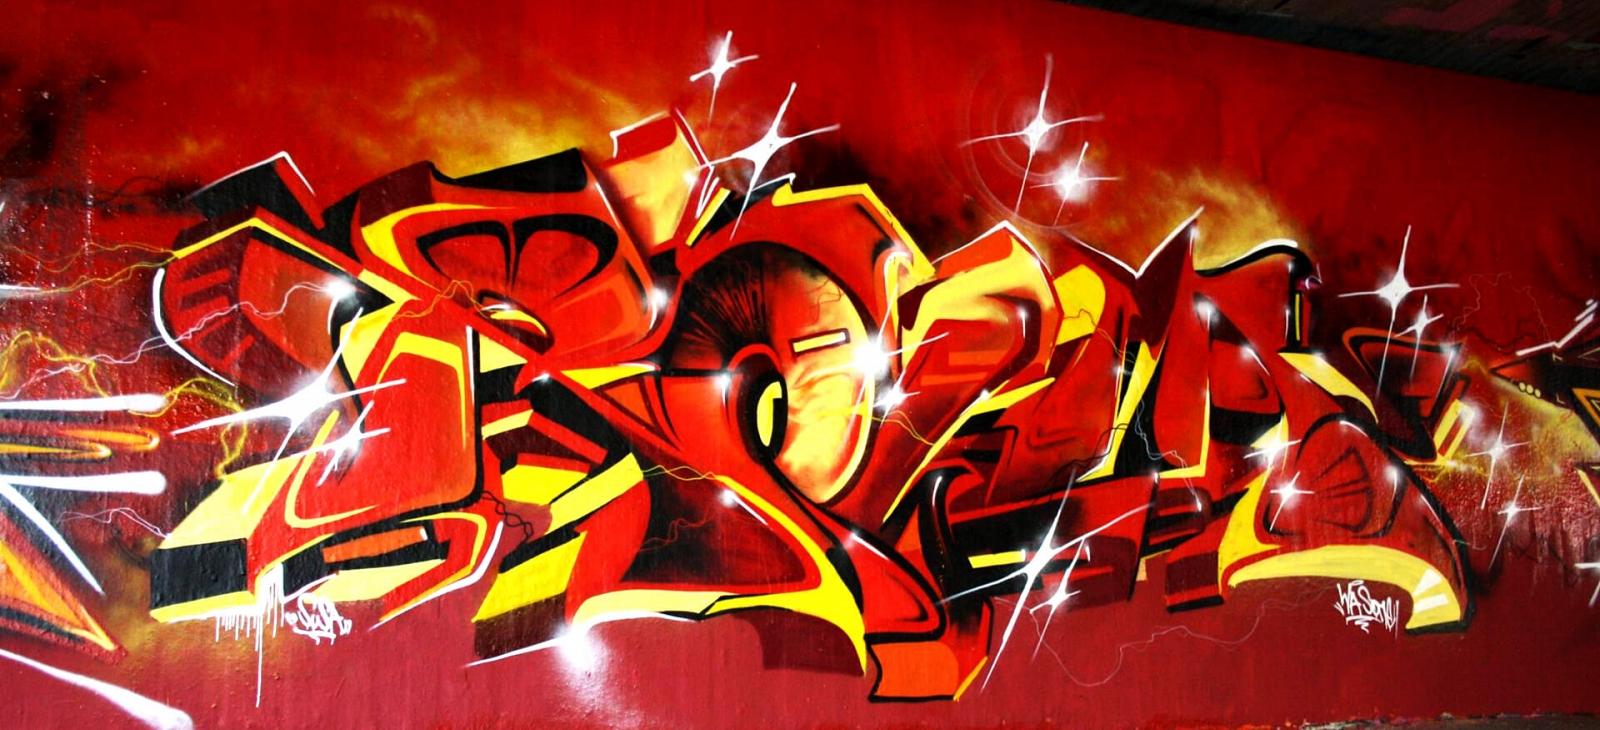 Graffiti Bochum Ruhruni WAS Rowa GBS Crew